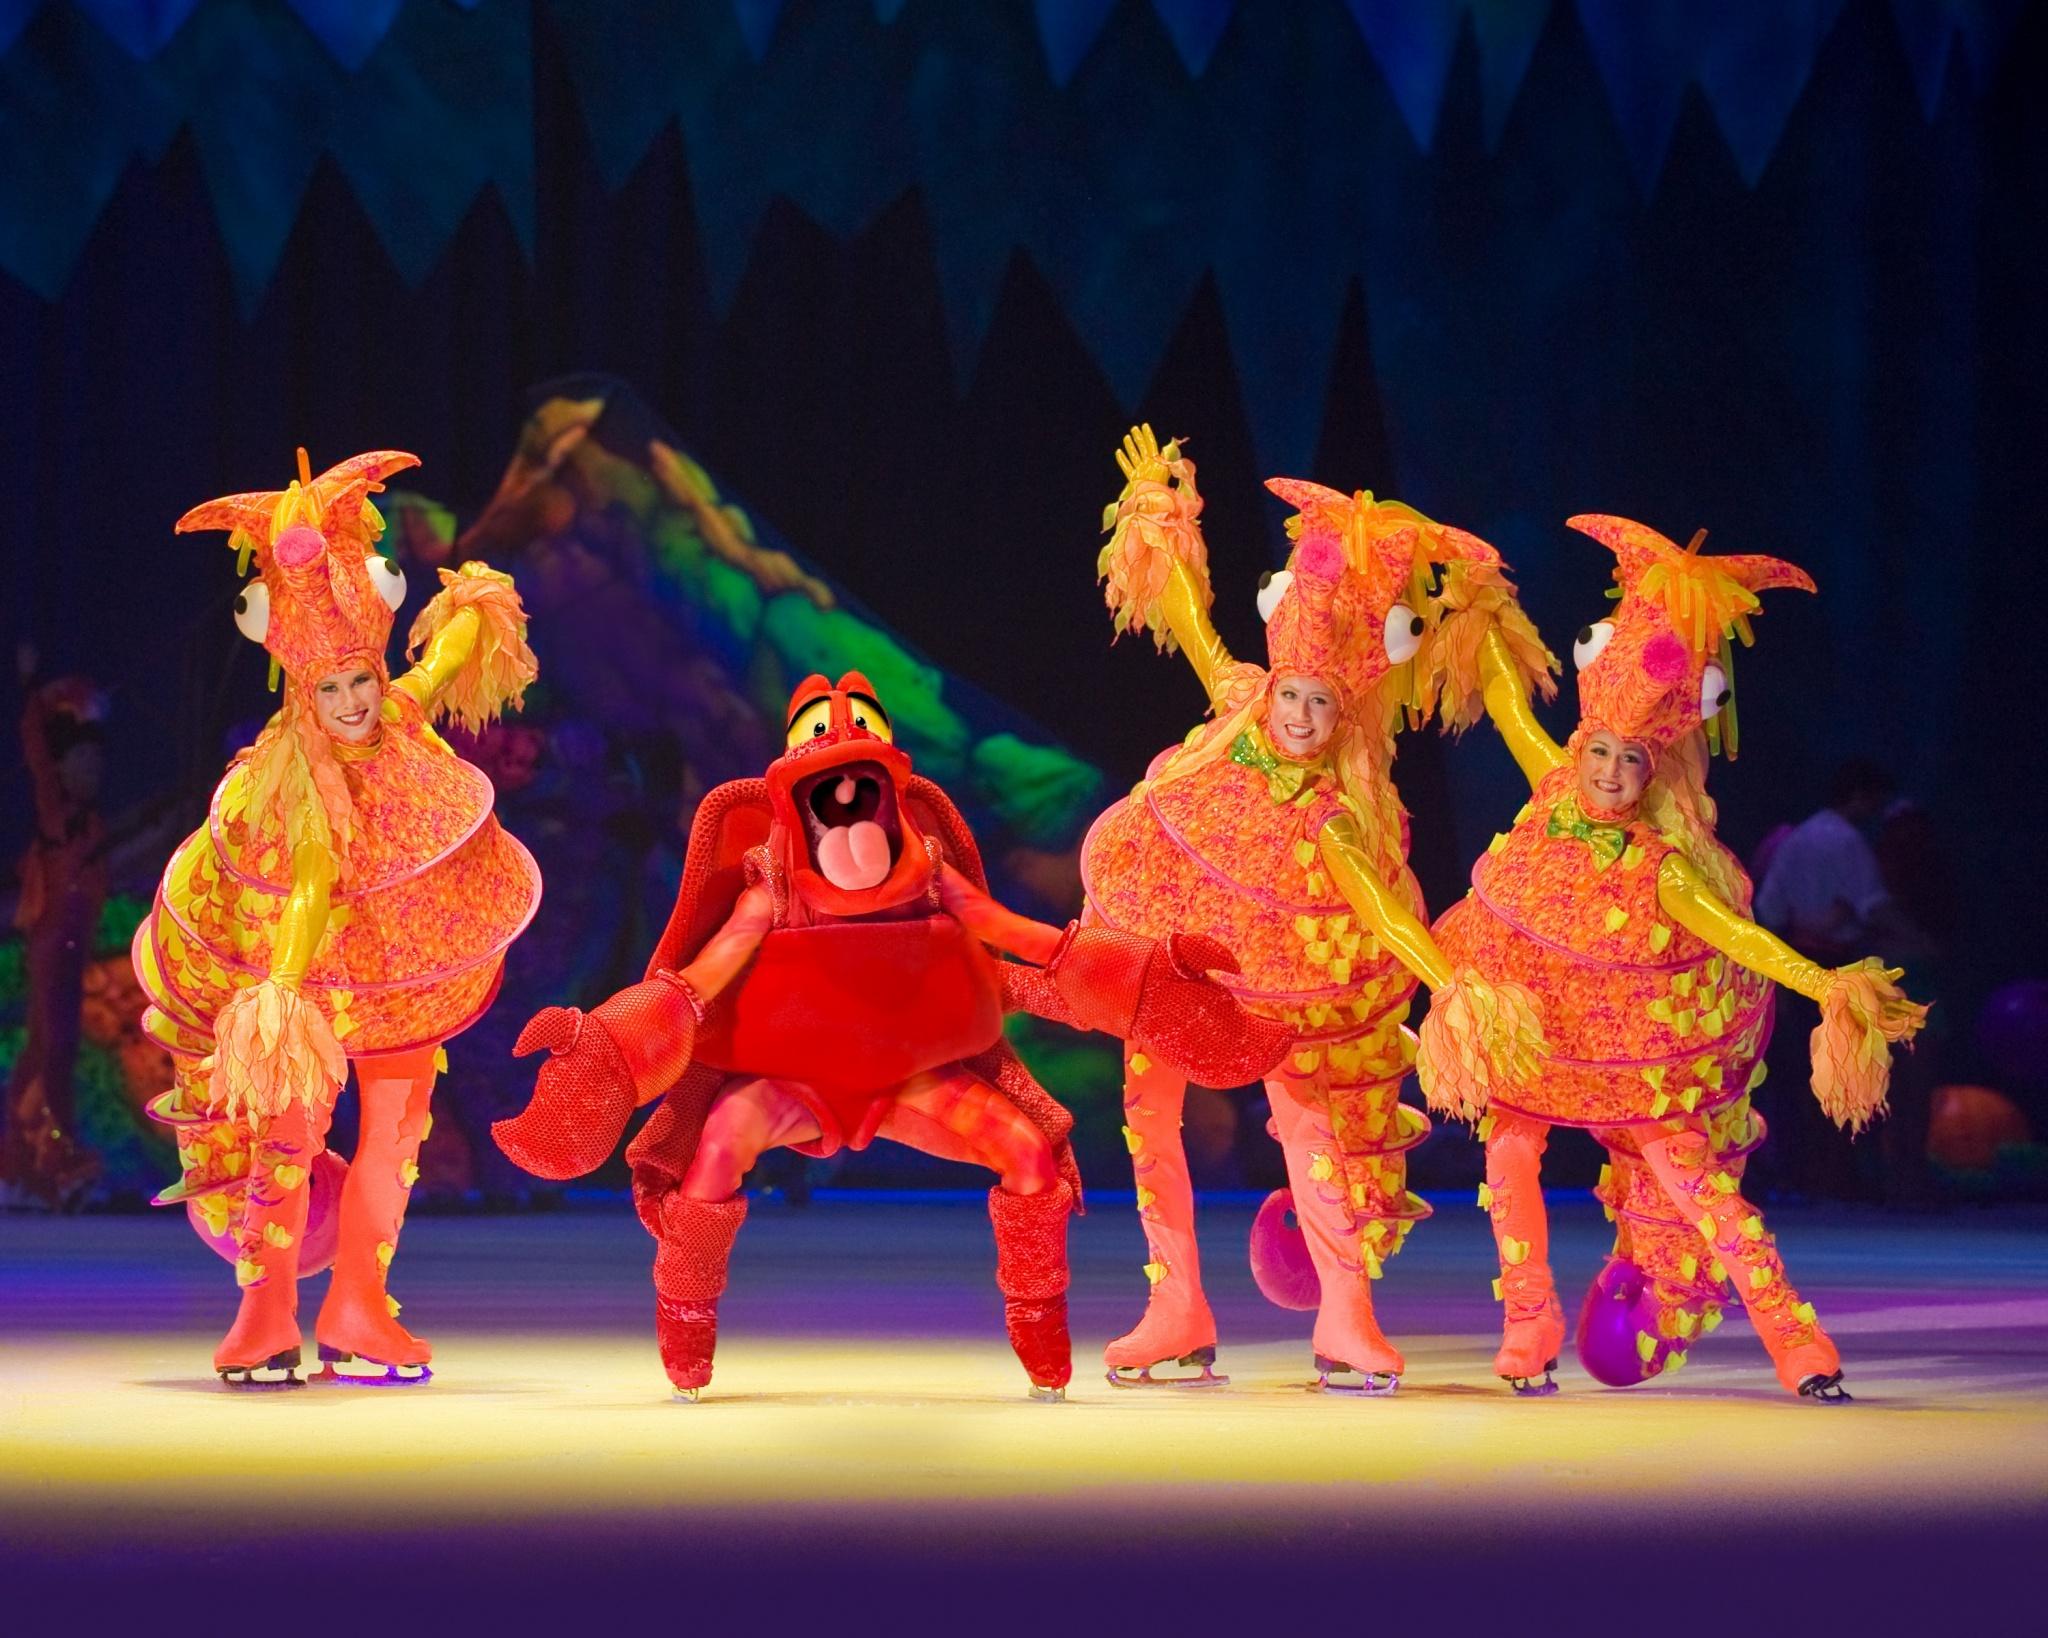 Sebastian the crab dancing with sea horses. Disney on Ice Presents Worlds of Fantasy. Image: Feld Entertainment.